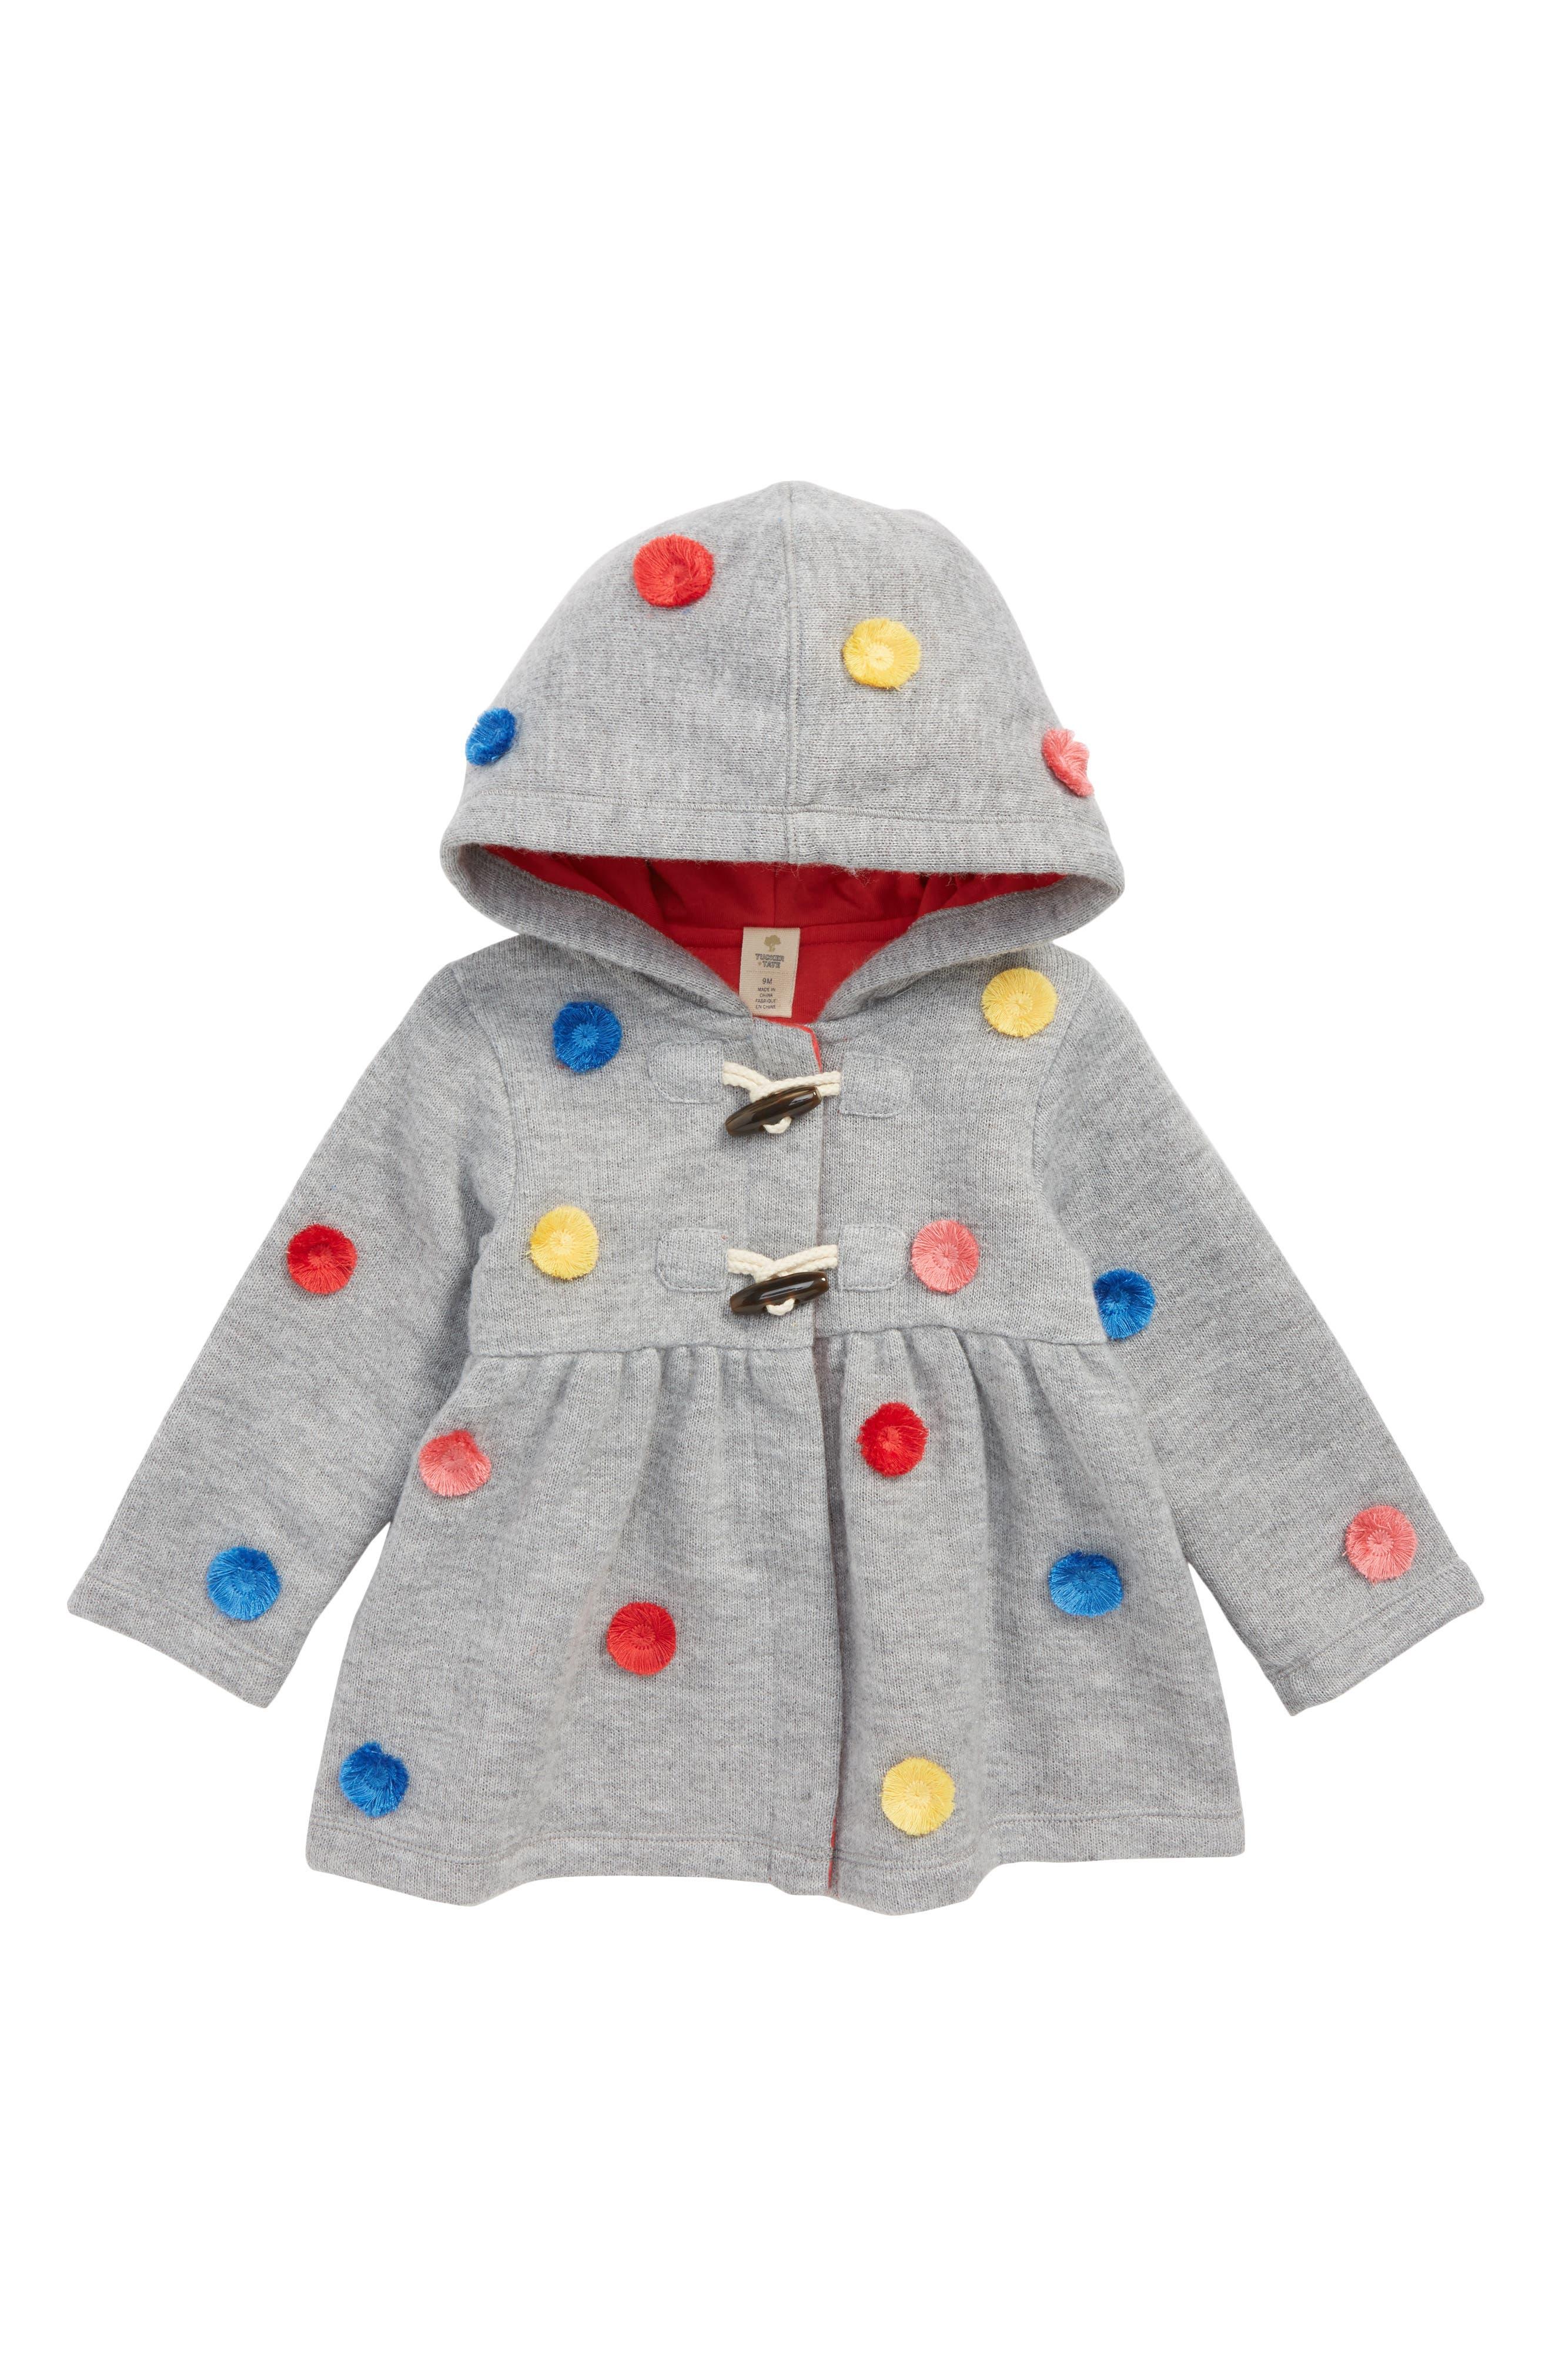 Pompom Hooded Knit Jacket,                             Main thumbnail 1, color,                             GREY ASH HEATHER